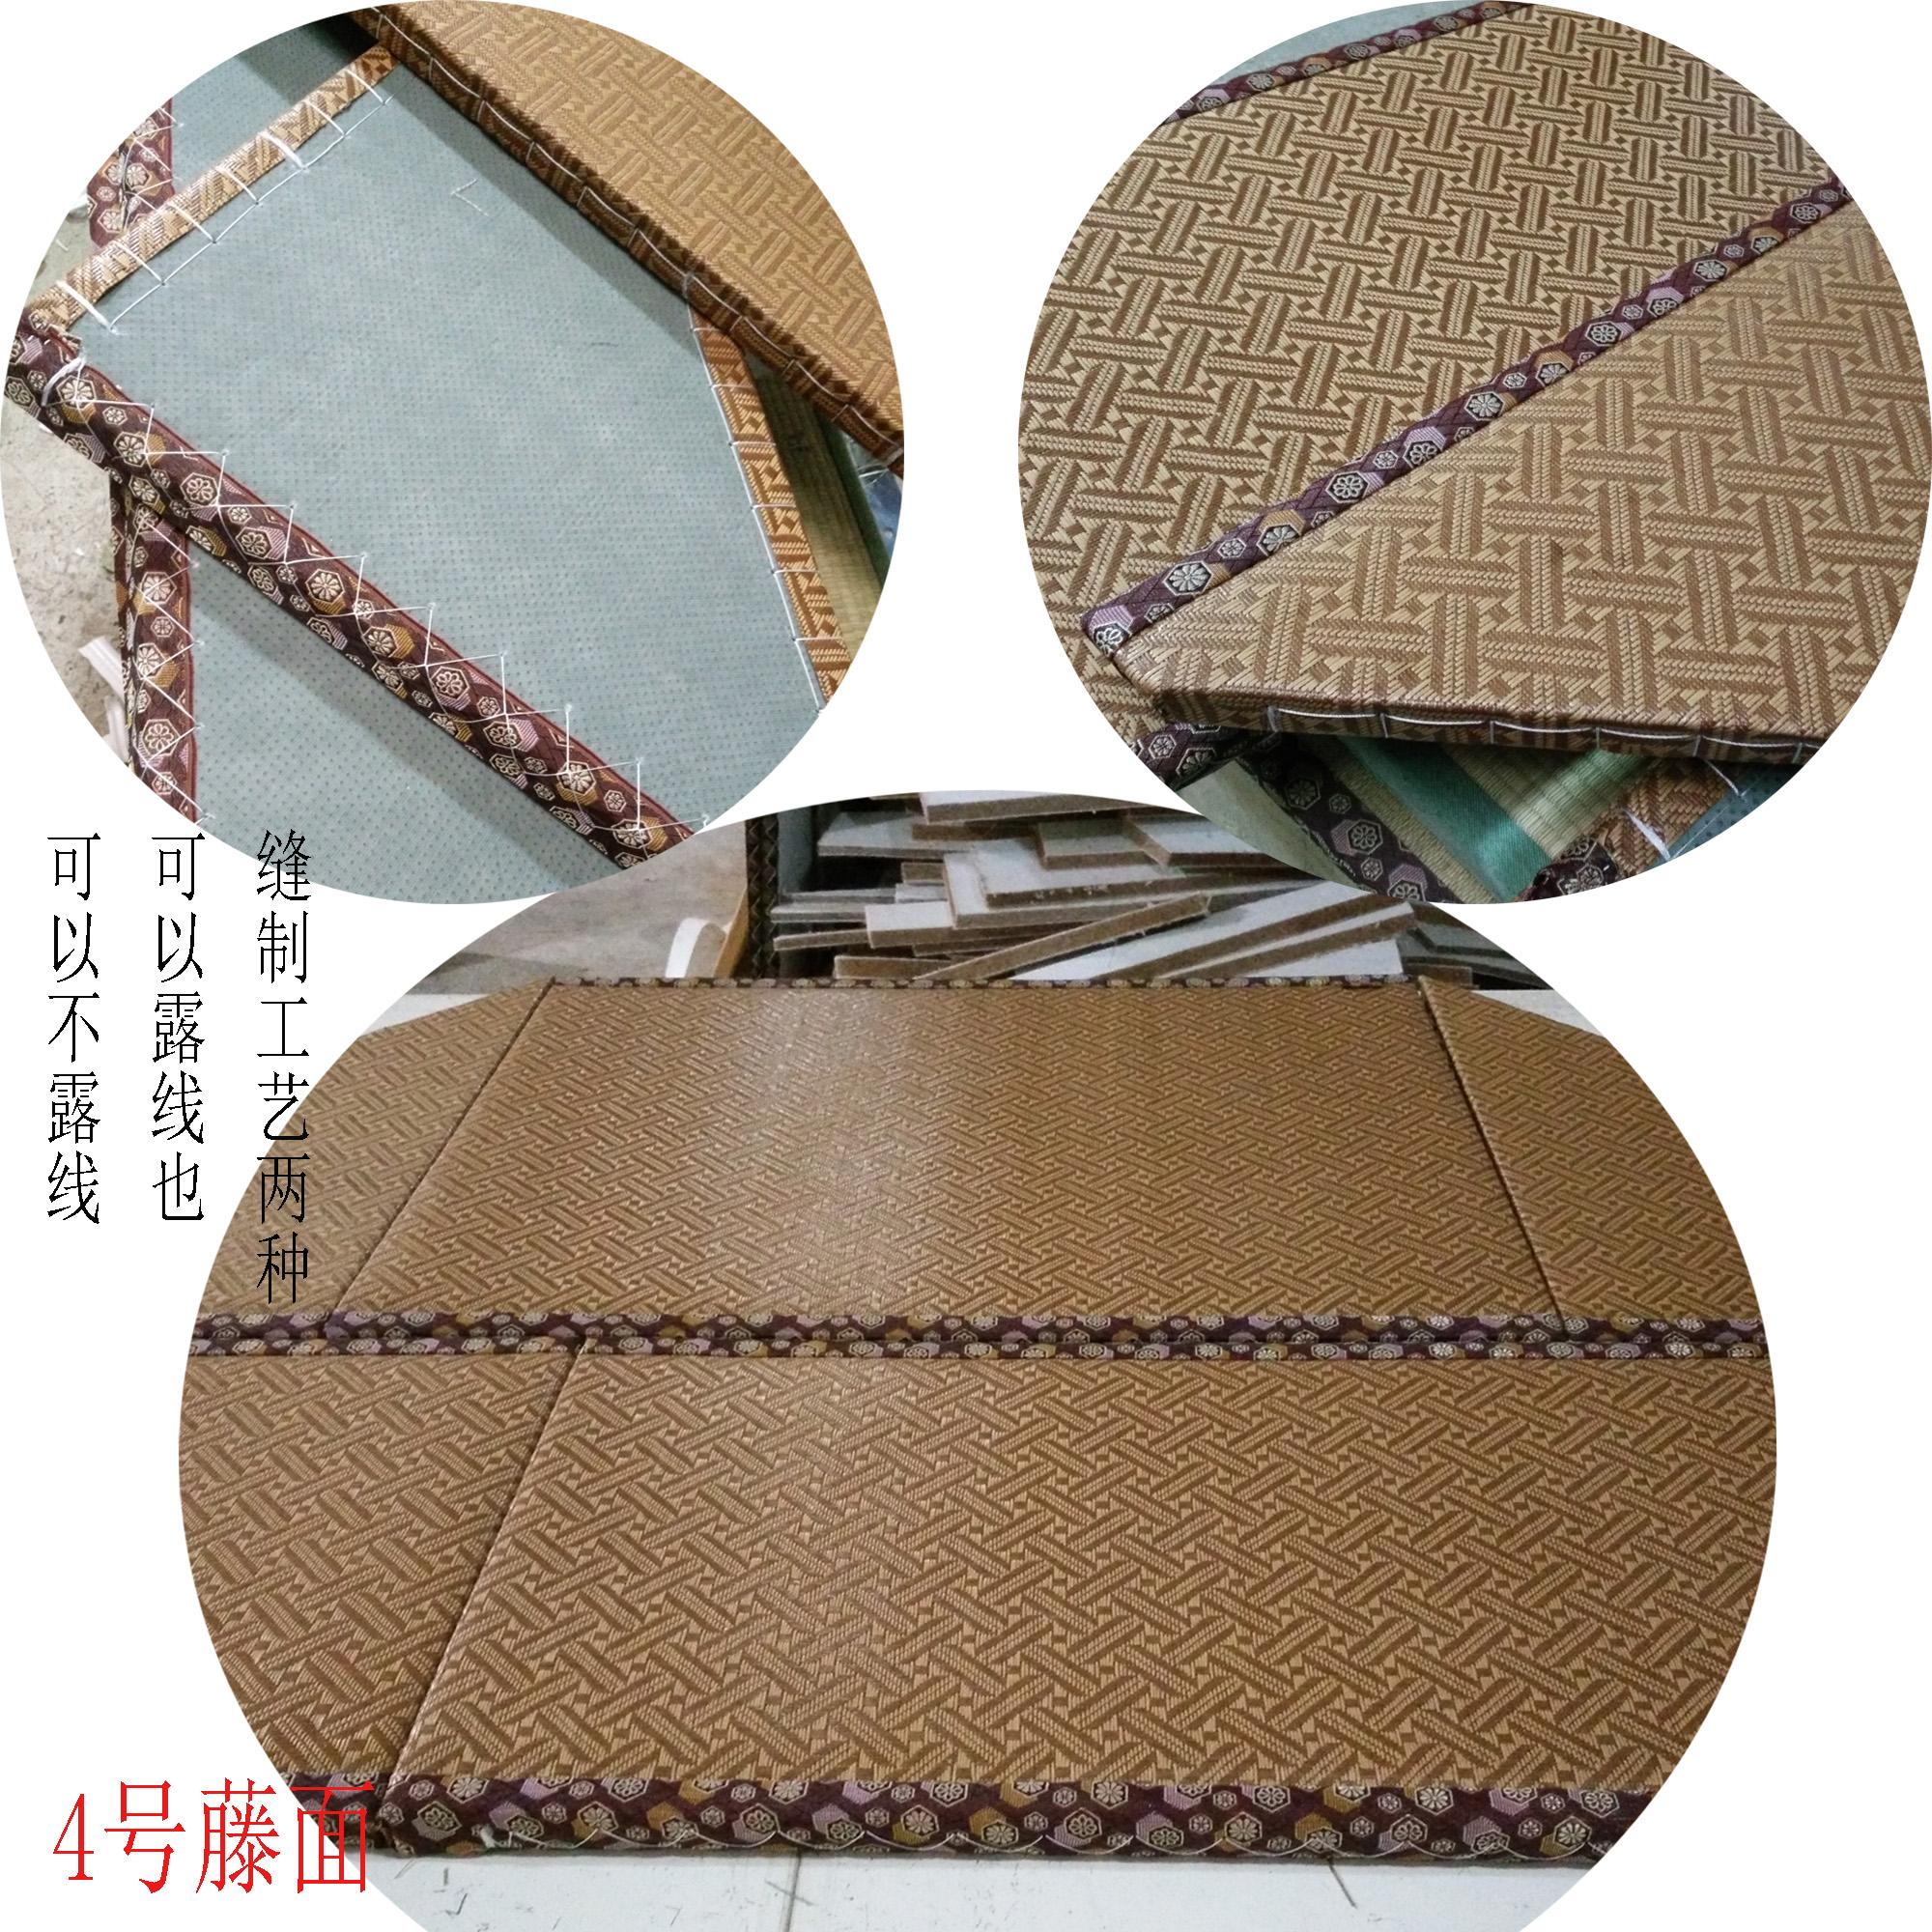 Shanghai tatami mattress pad pad platform customized coconut core Royal rattan home measuring factory outlets